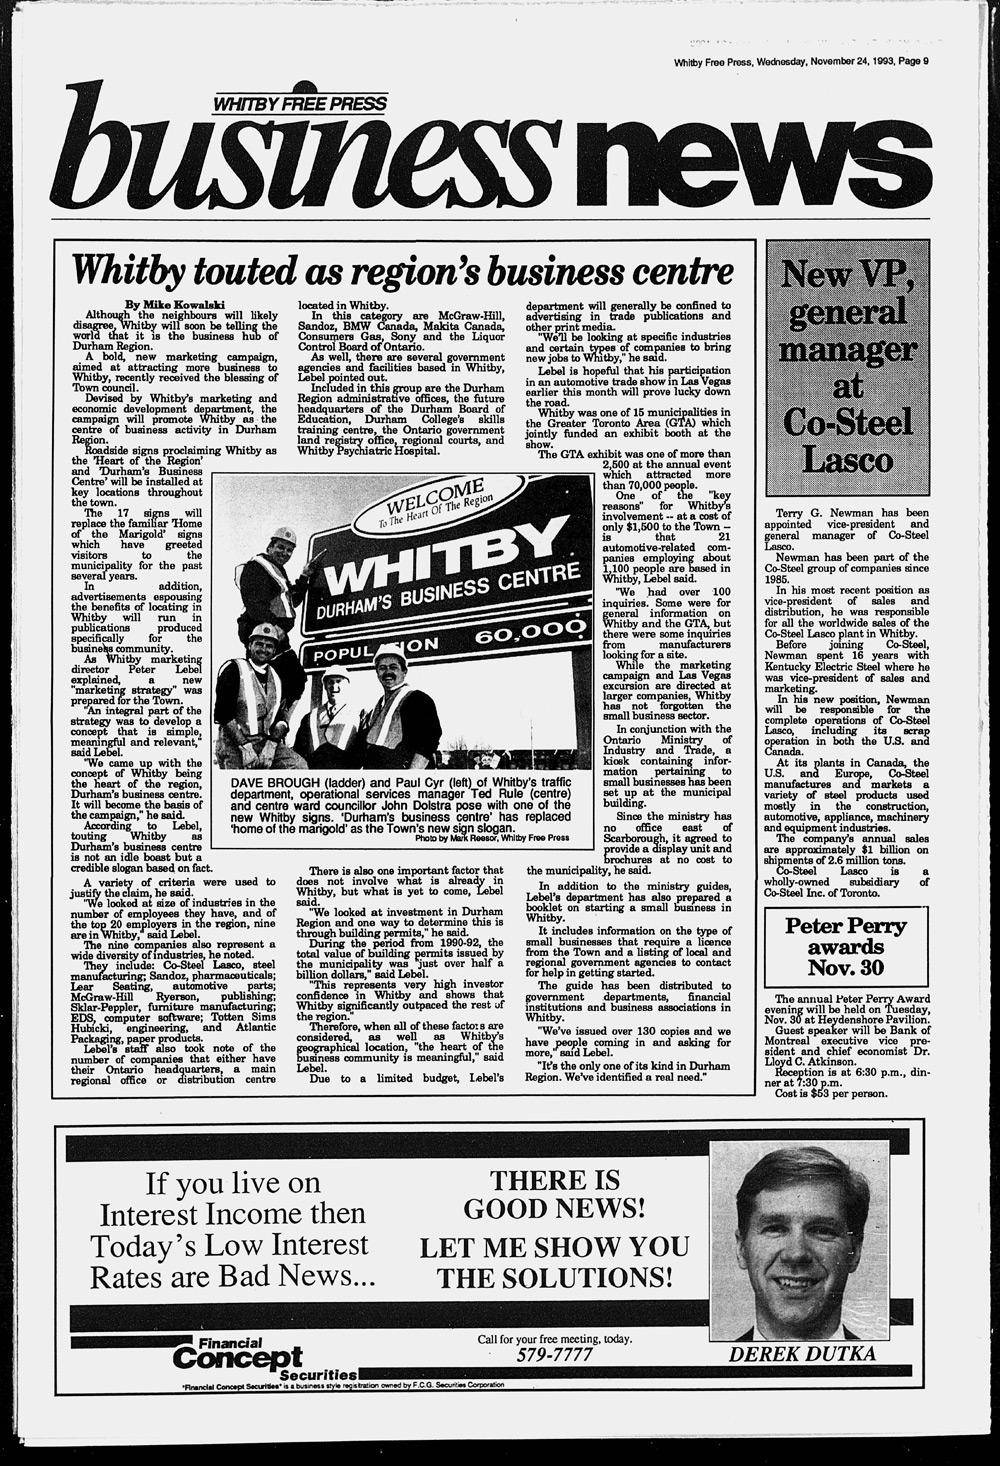 Whitby Free Press, 24 Nov 1993